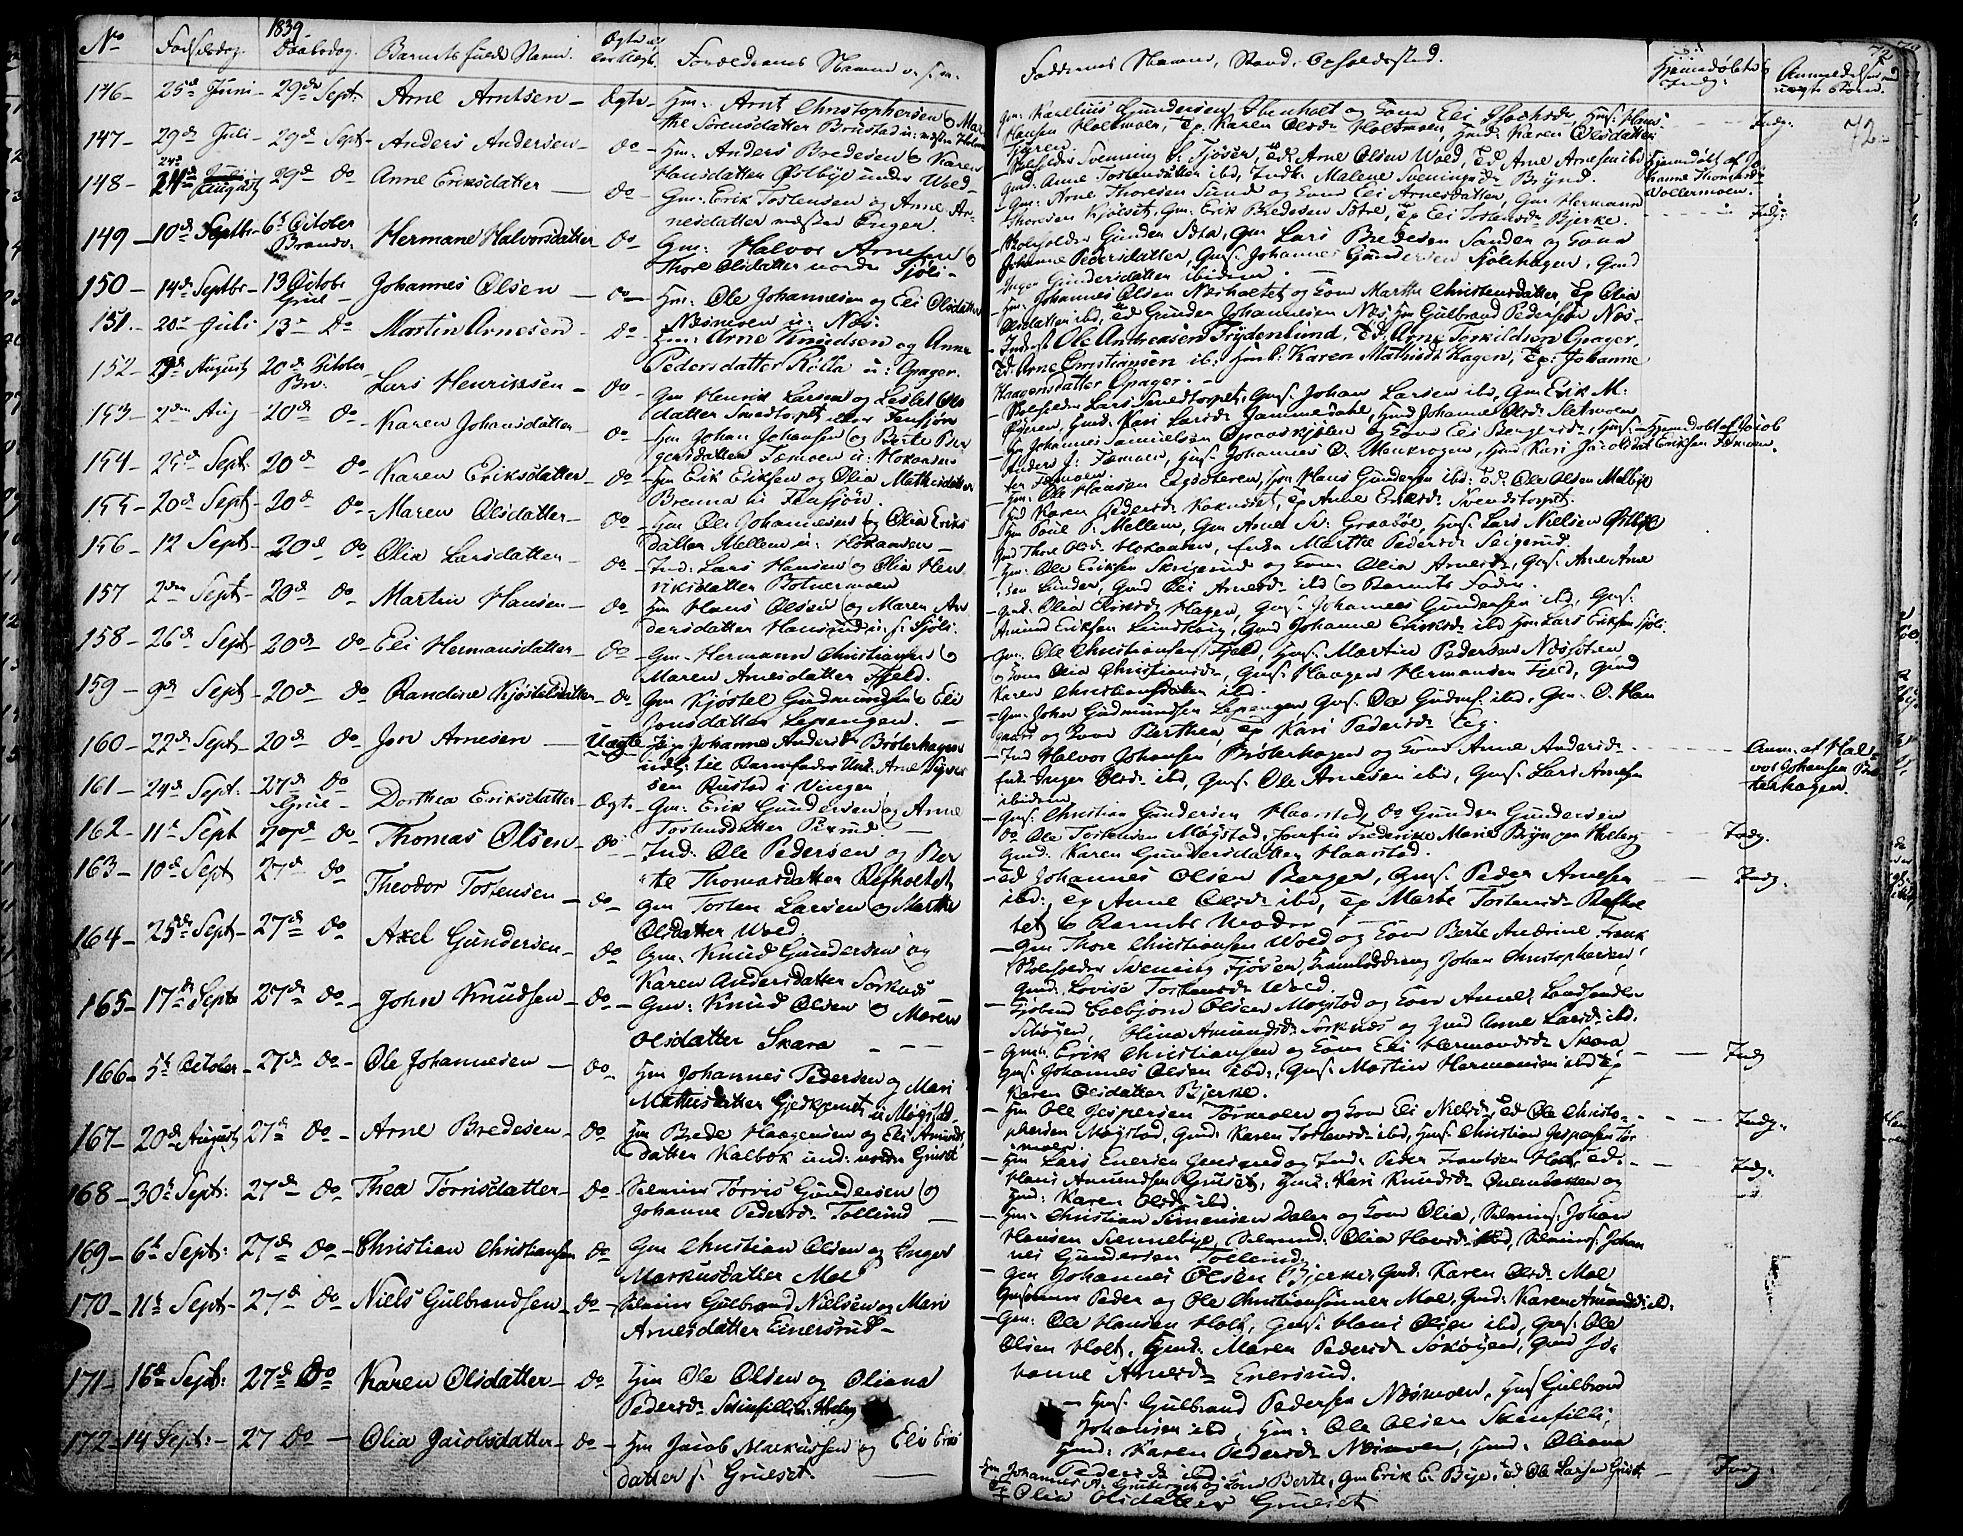 SAH, Grue prestekontor, Ministerialbok nr. 7, 1830-1847, s. 72